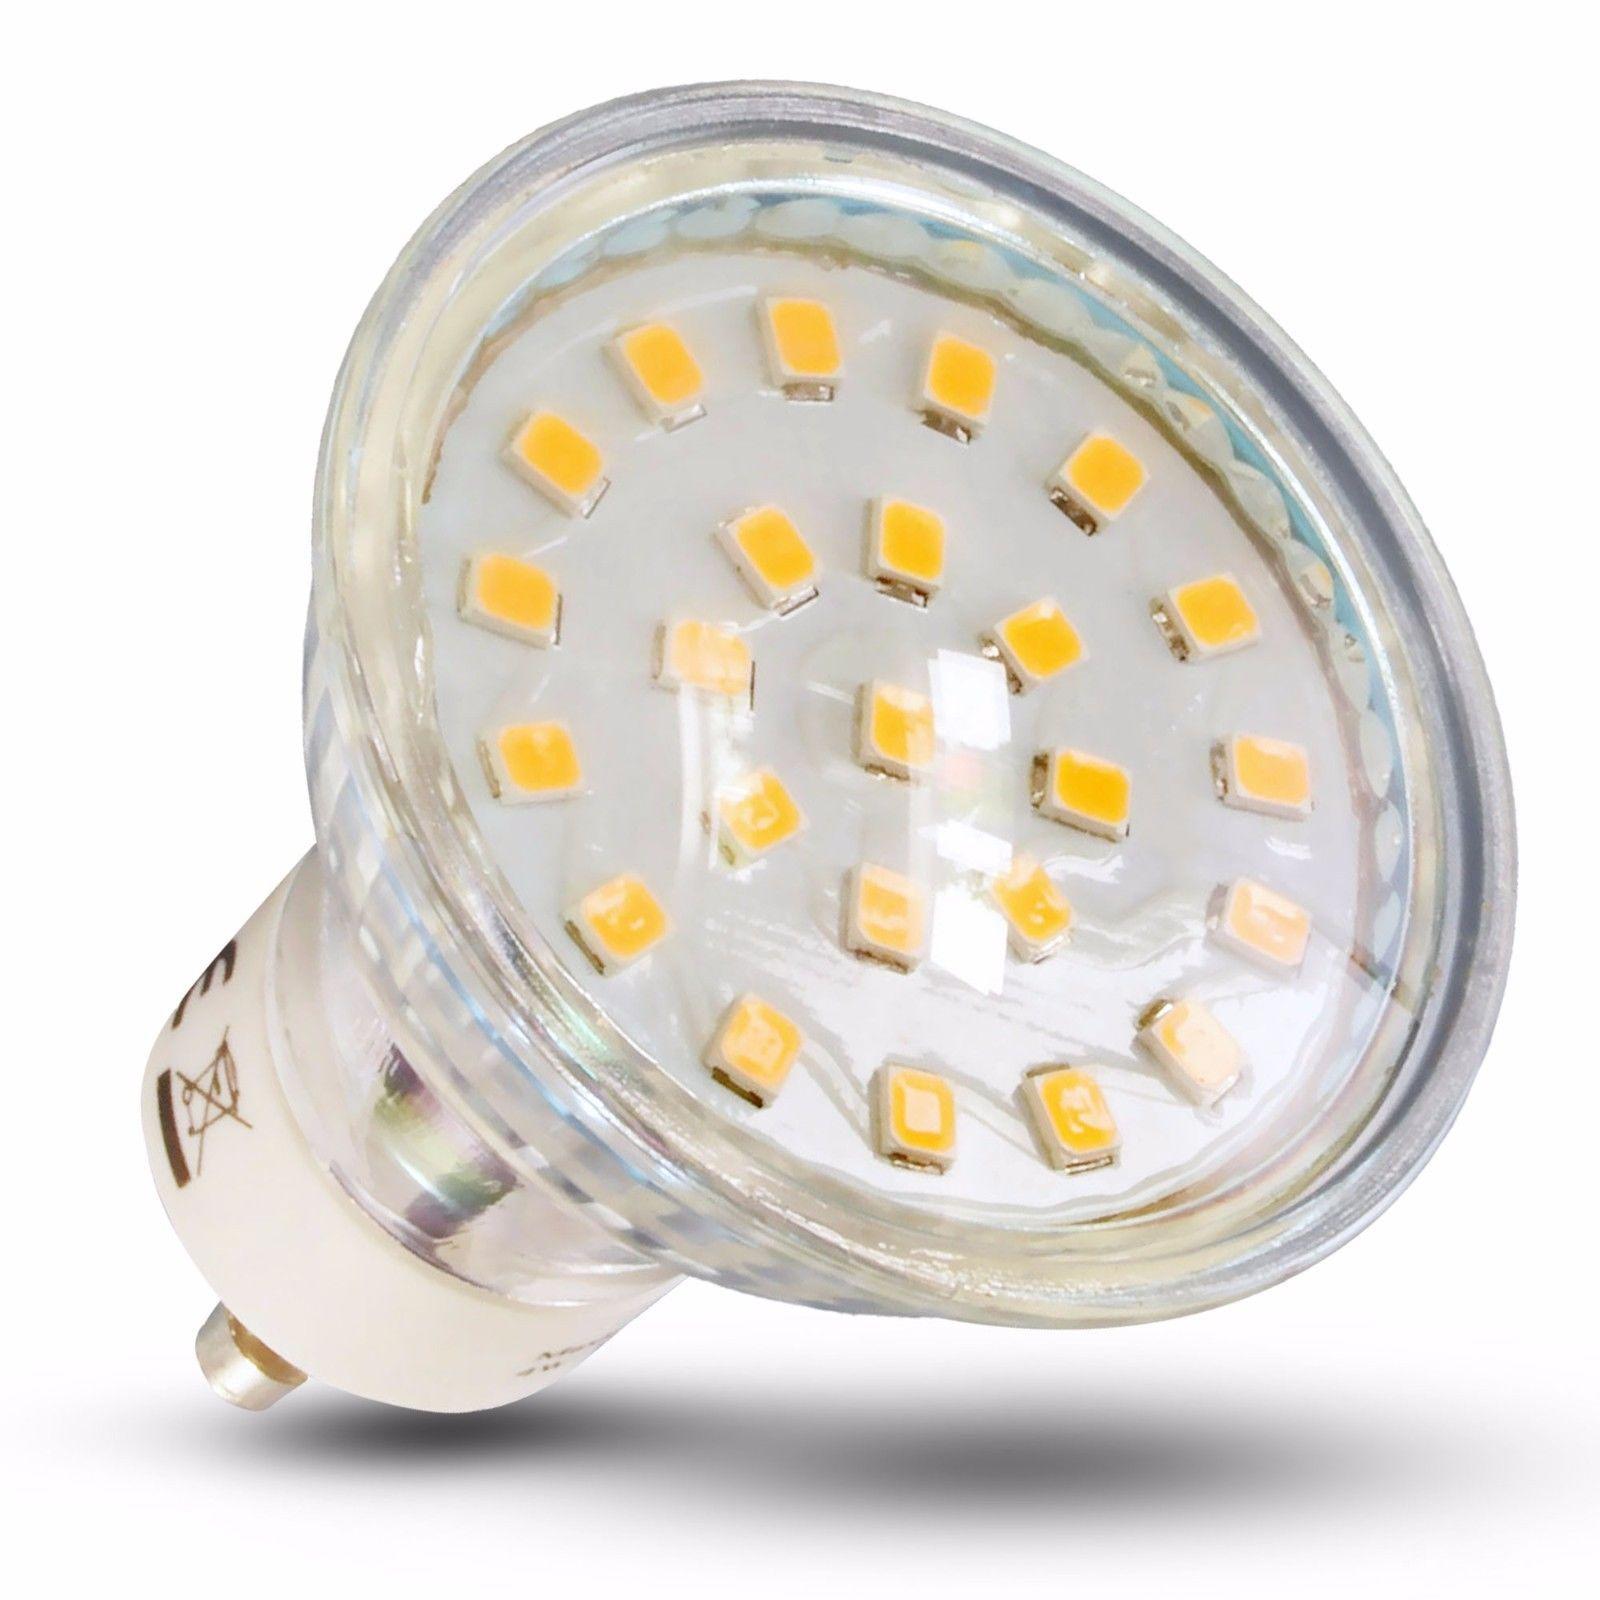 Details Zu Led Leuchtmittel Lampe Gu10 4w Smd Strahler